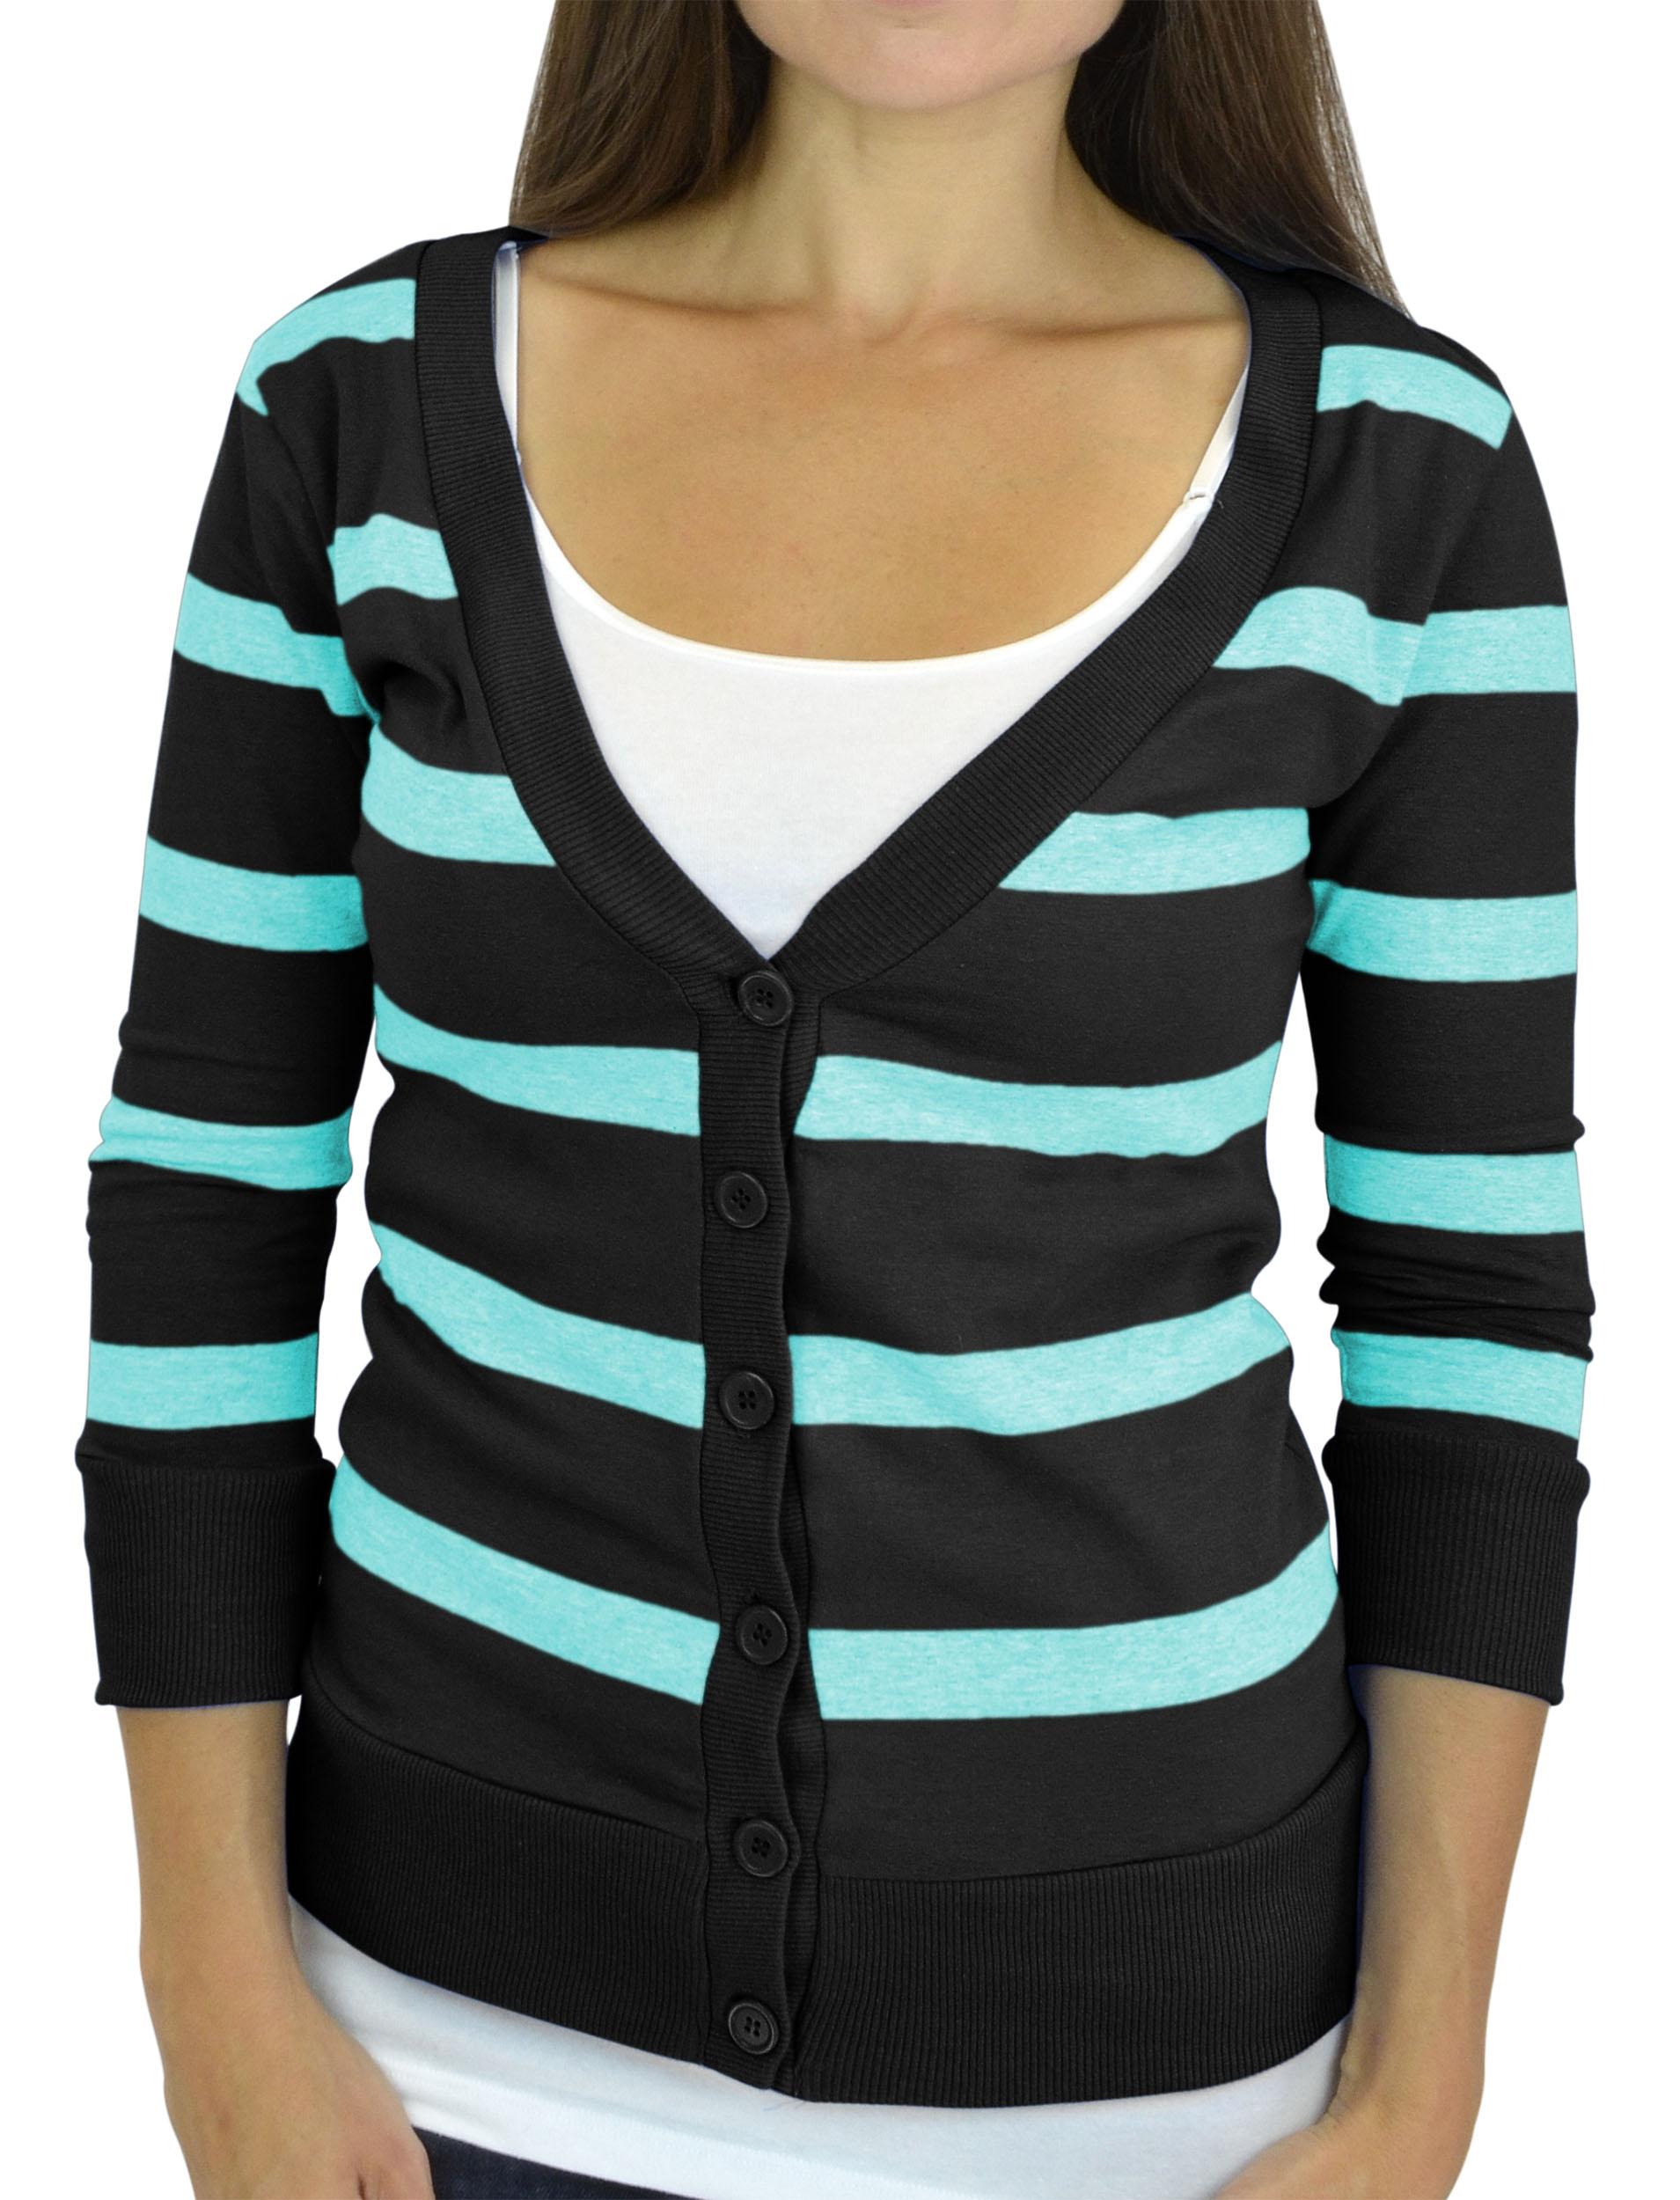 Belle Donne - Women / Girl Junior Size Soft 3/4 Sleeve V-Neck 6 Button Cardigans - Black/Medium